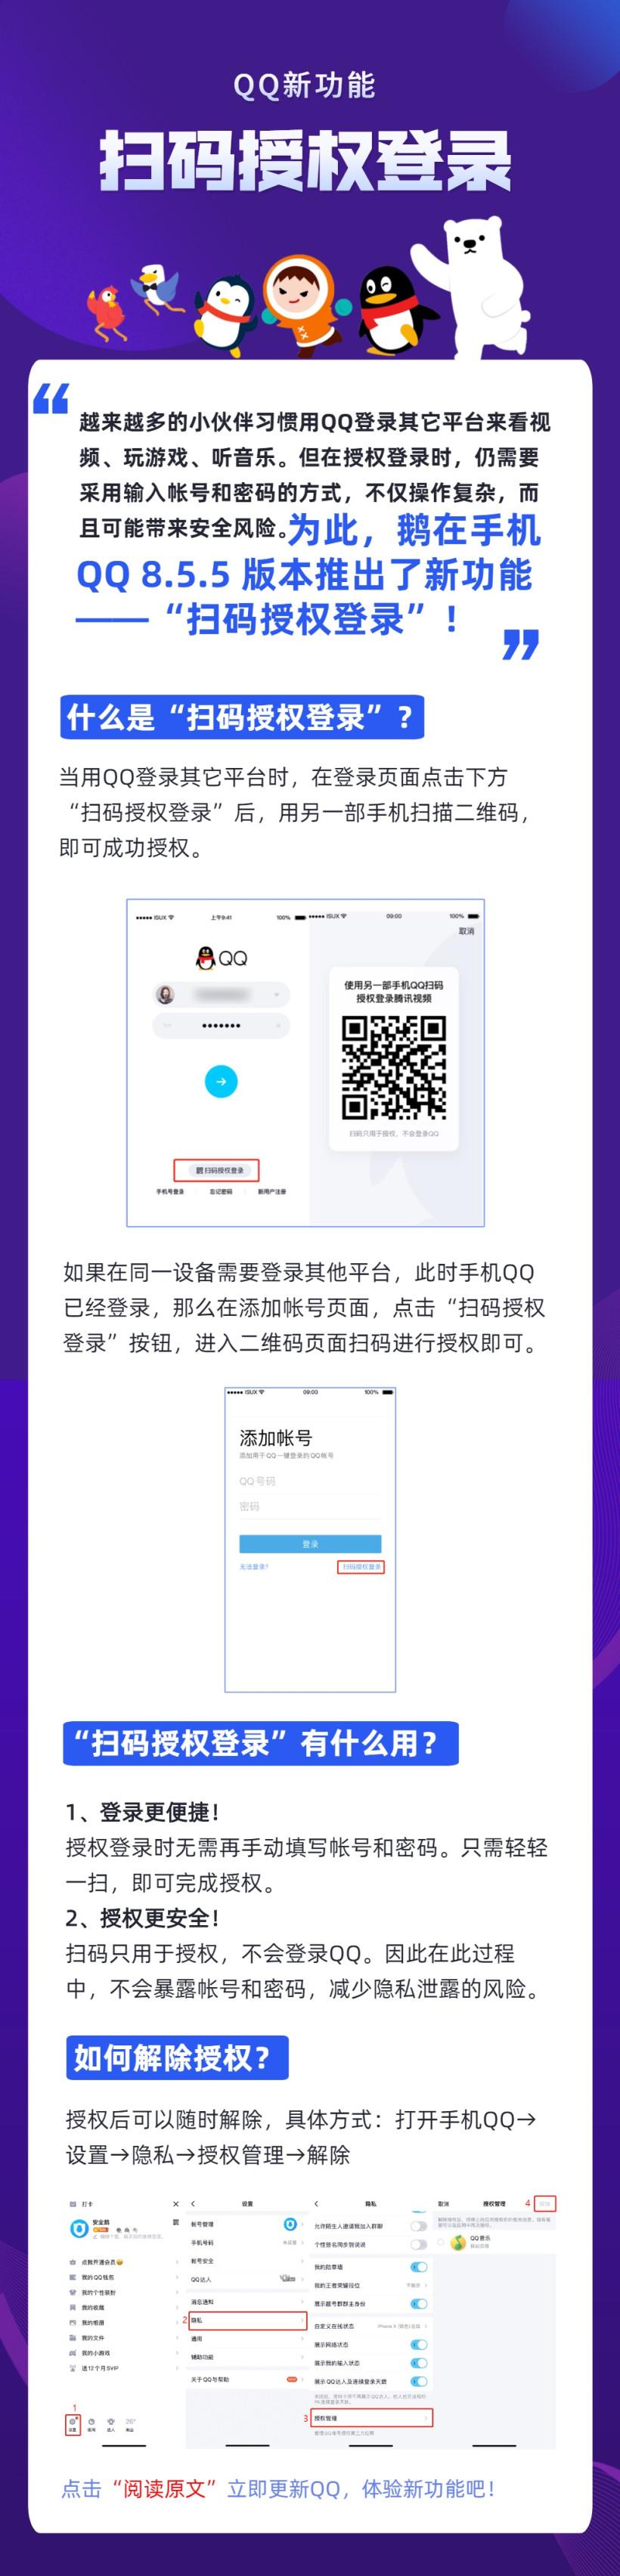 《QQ》扫码授权登录功能介绍